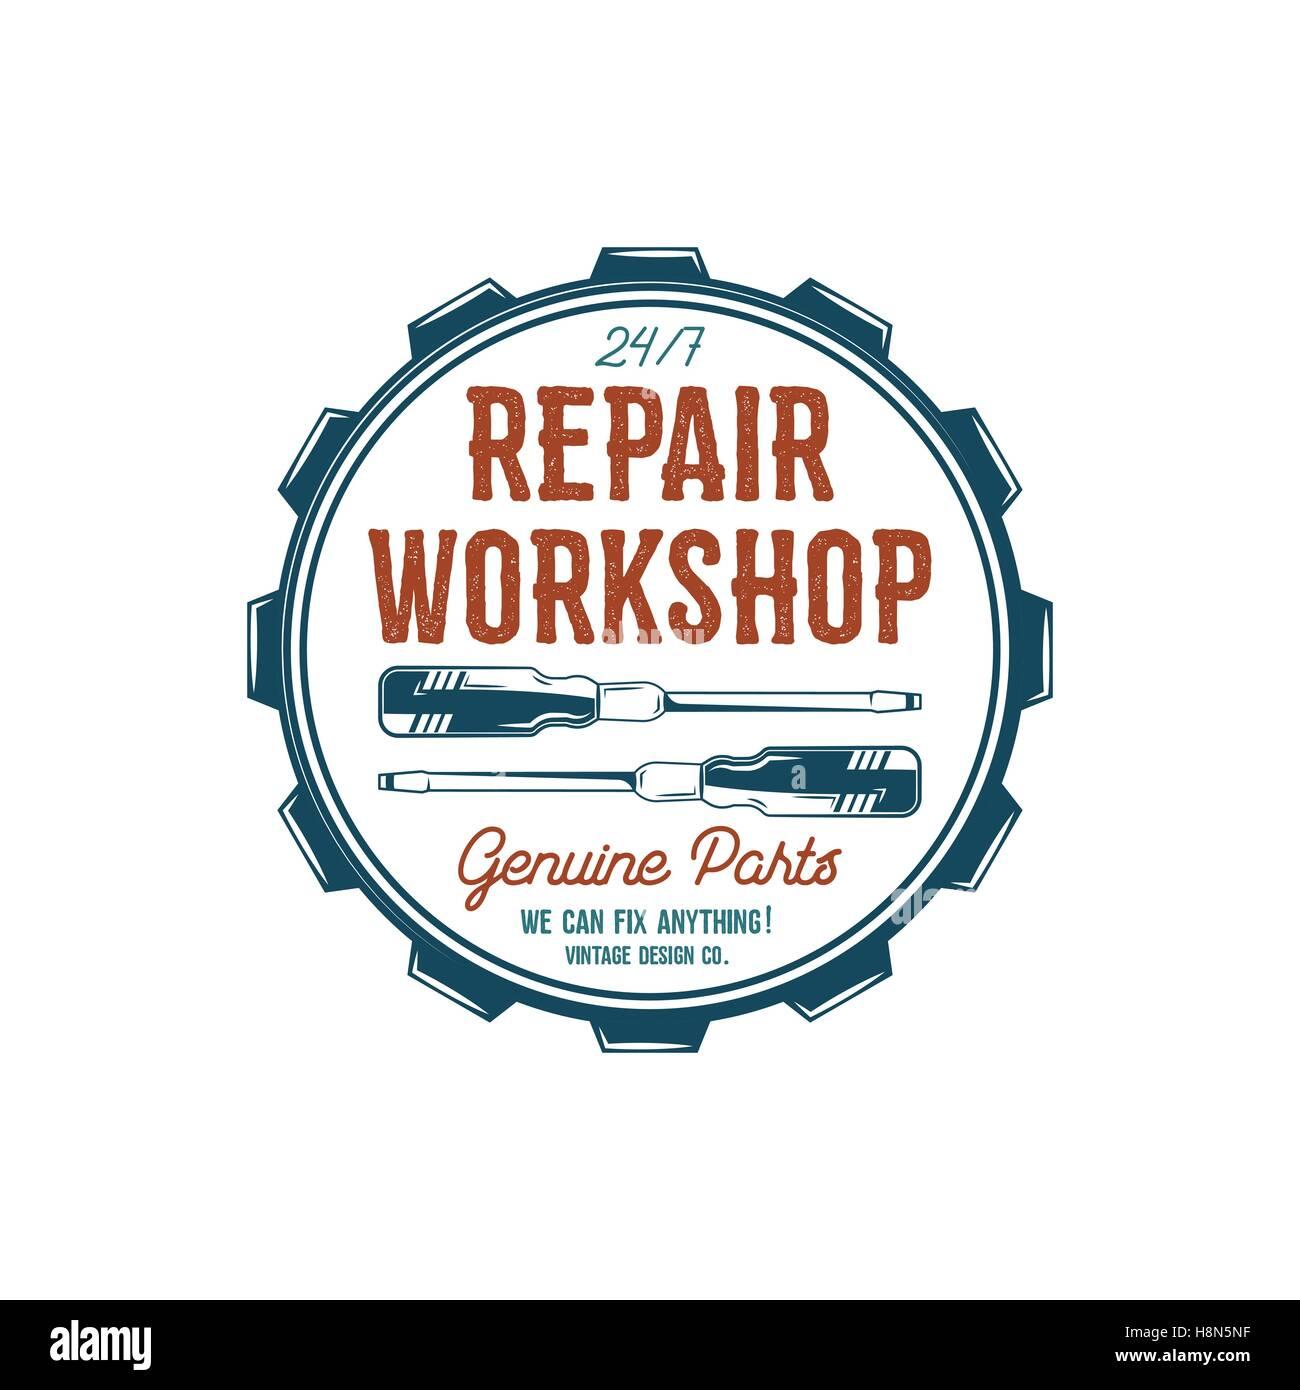 Vintage label design. Repair workshop emblem in retro colors style ...